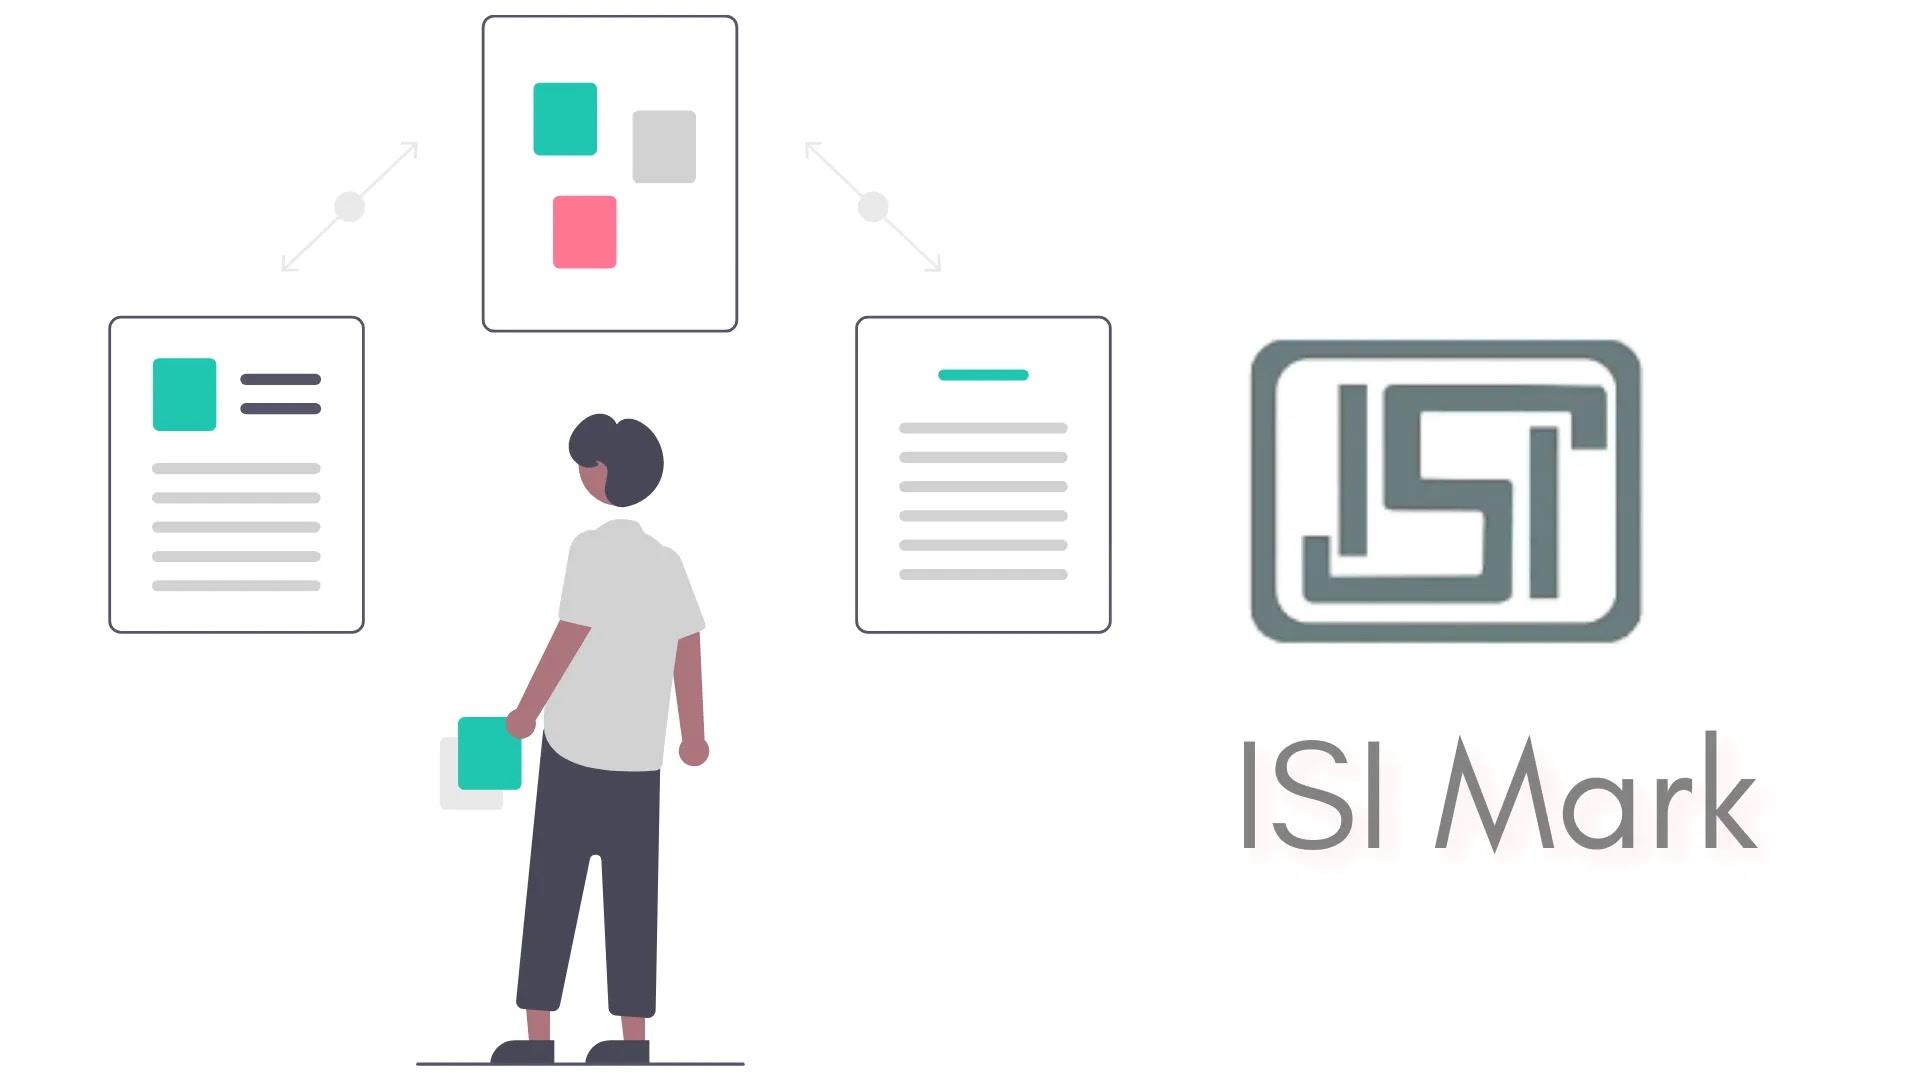 ISI Mark Full form